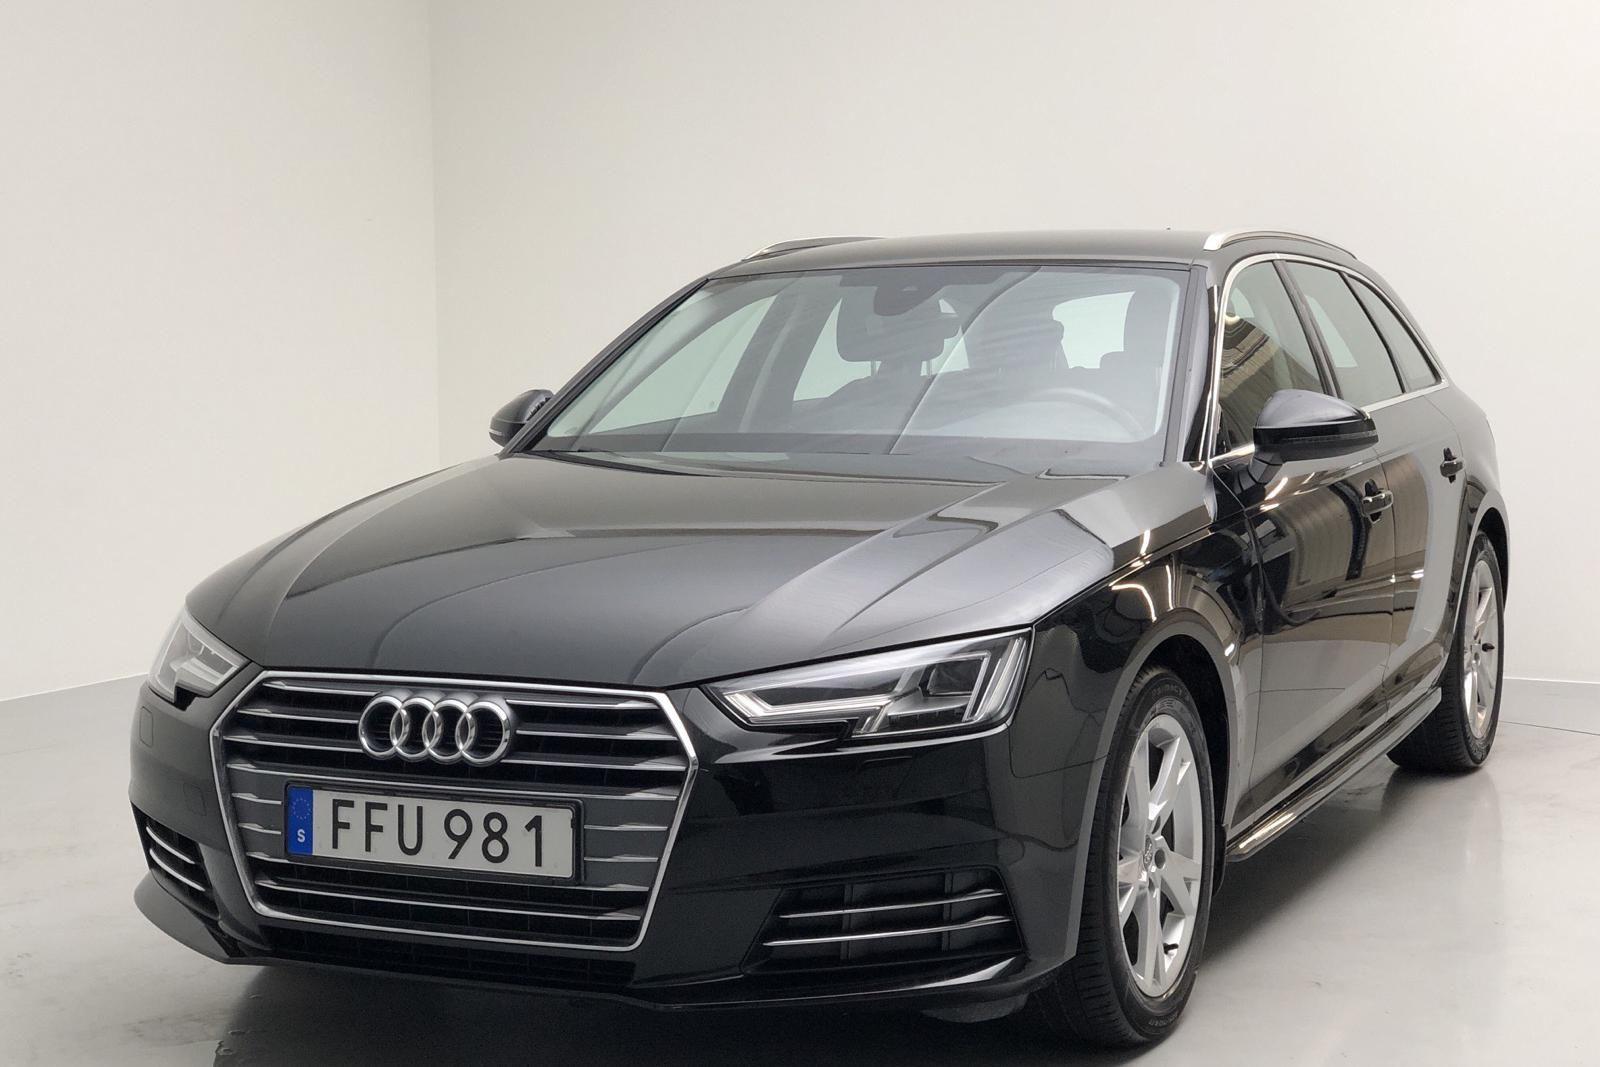 Audi A4 2.0 TDI Avant (150hk)